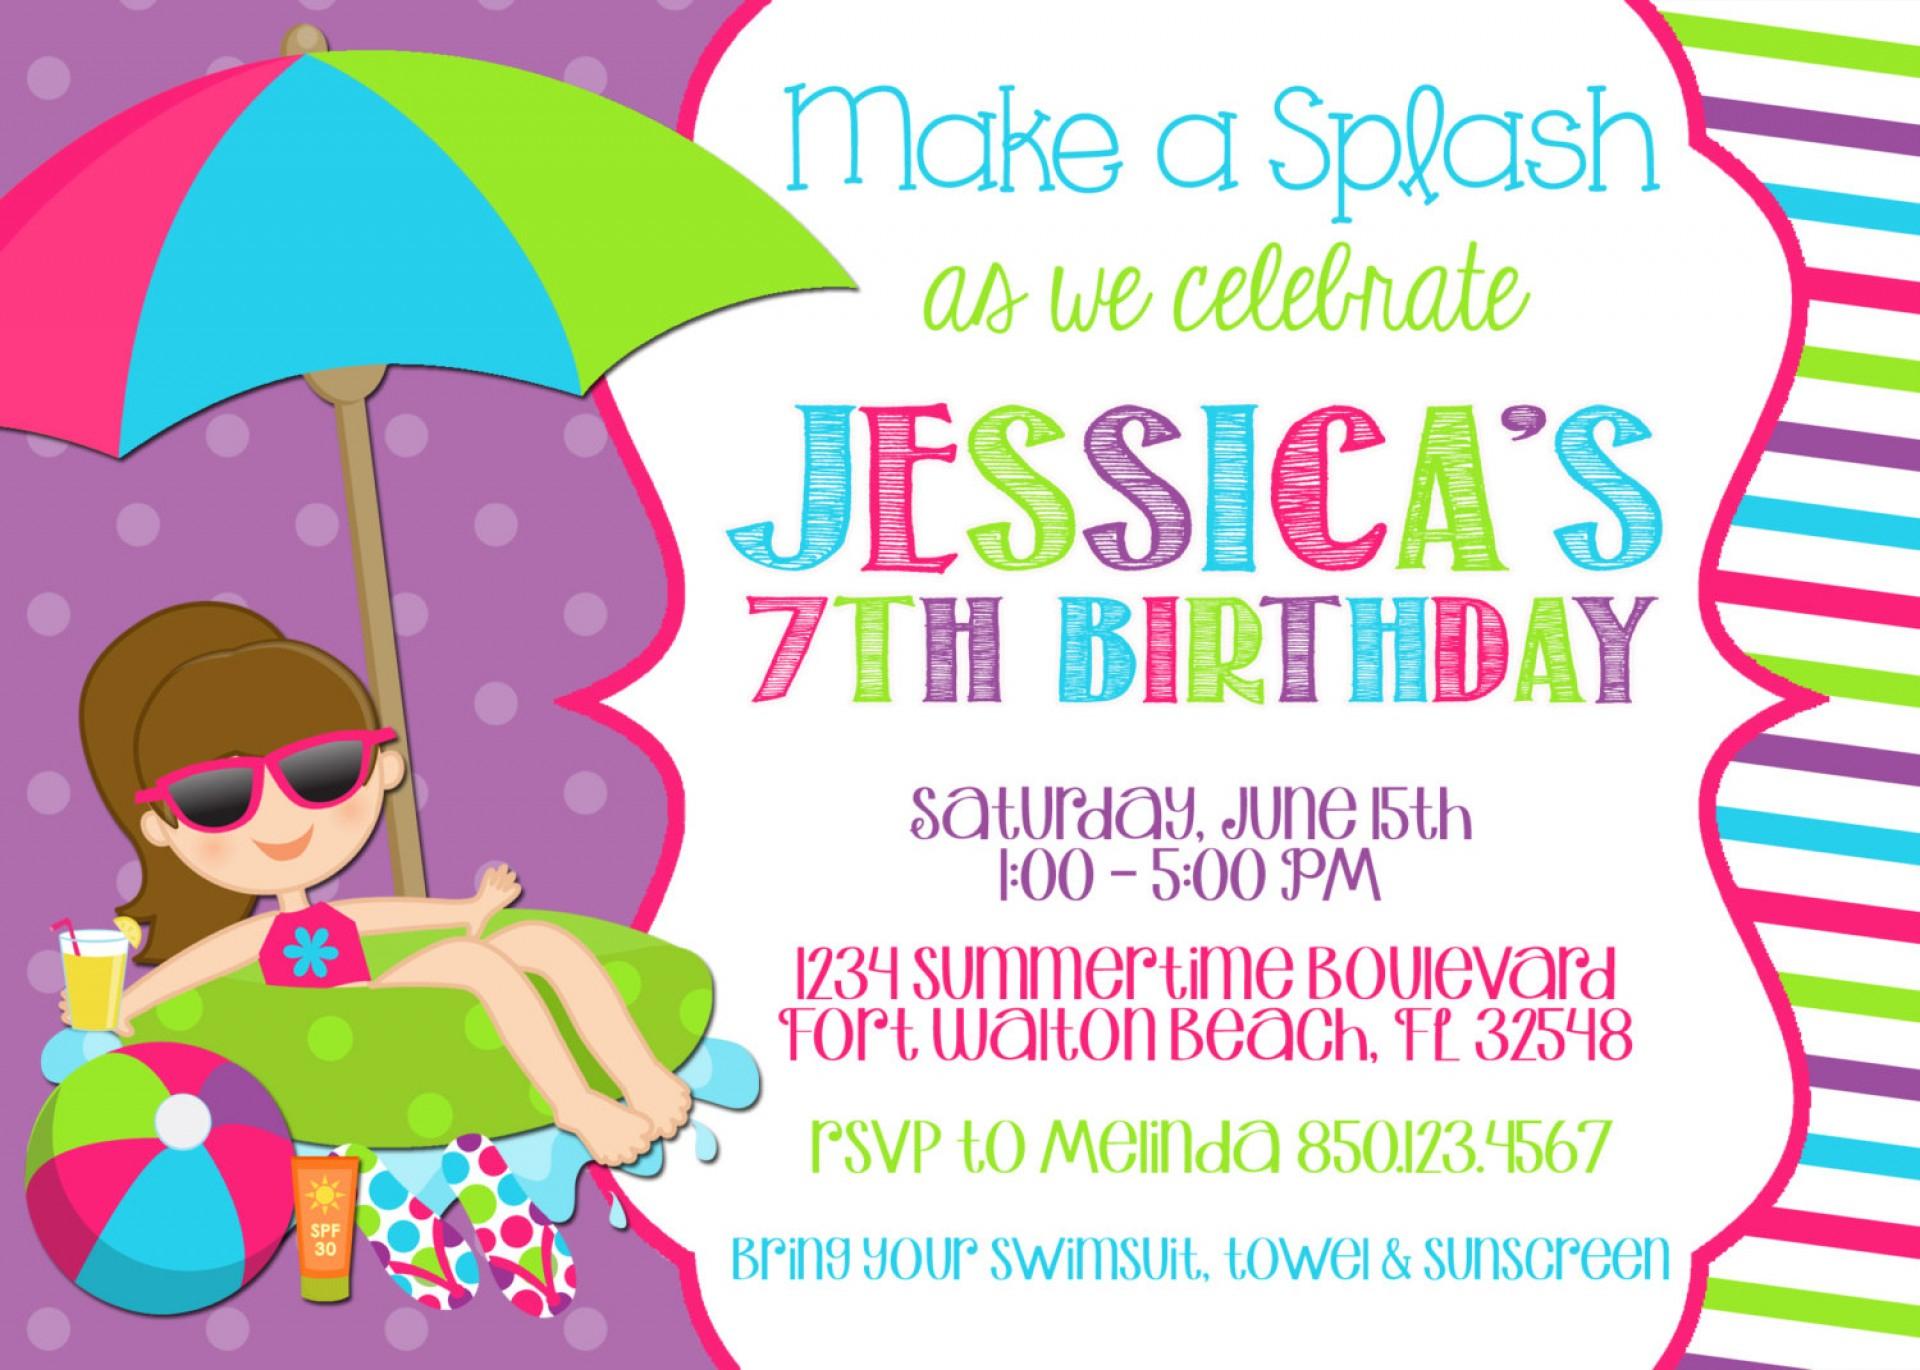 026 Birthday Invitation Templates Free Printable Template Ideas Pool - Free Printable Pool Party Birthday Invitations